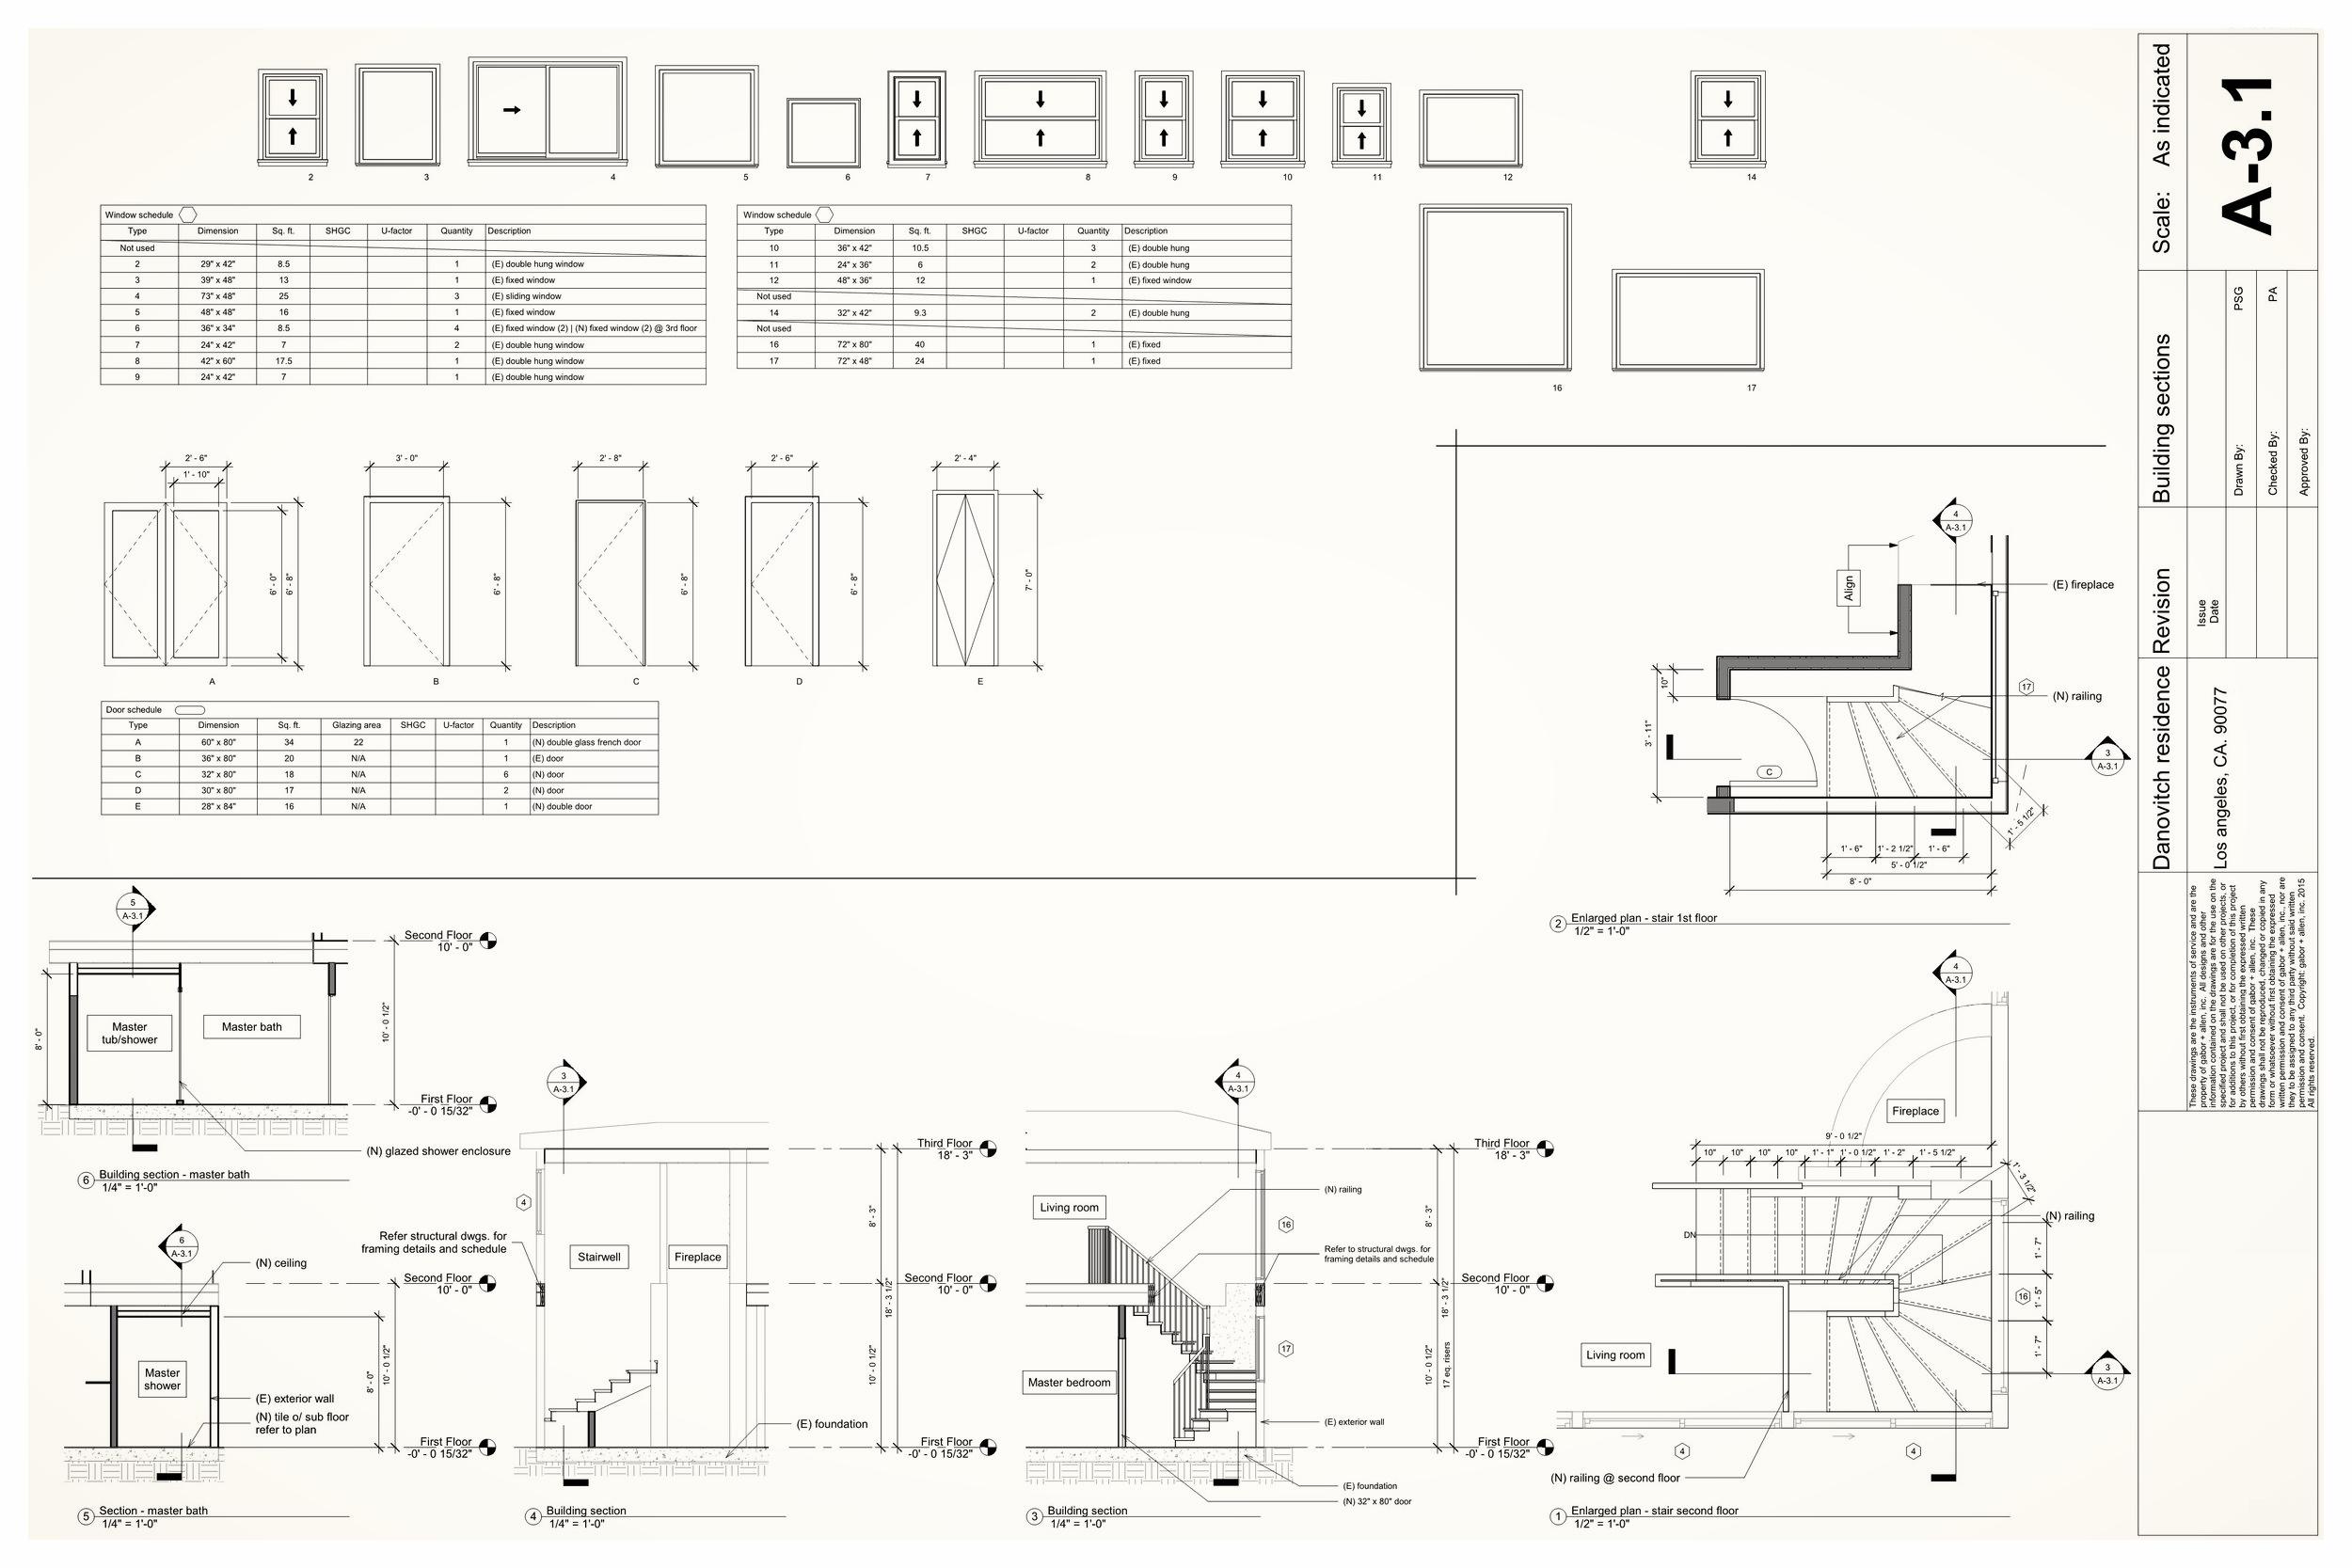 Danovitch-set-12.10.18 Page 005.jpg